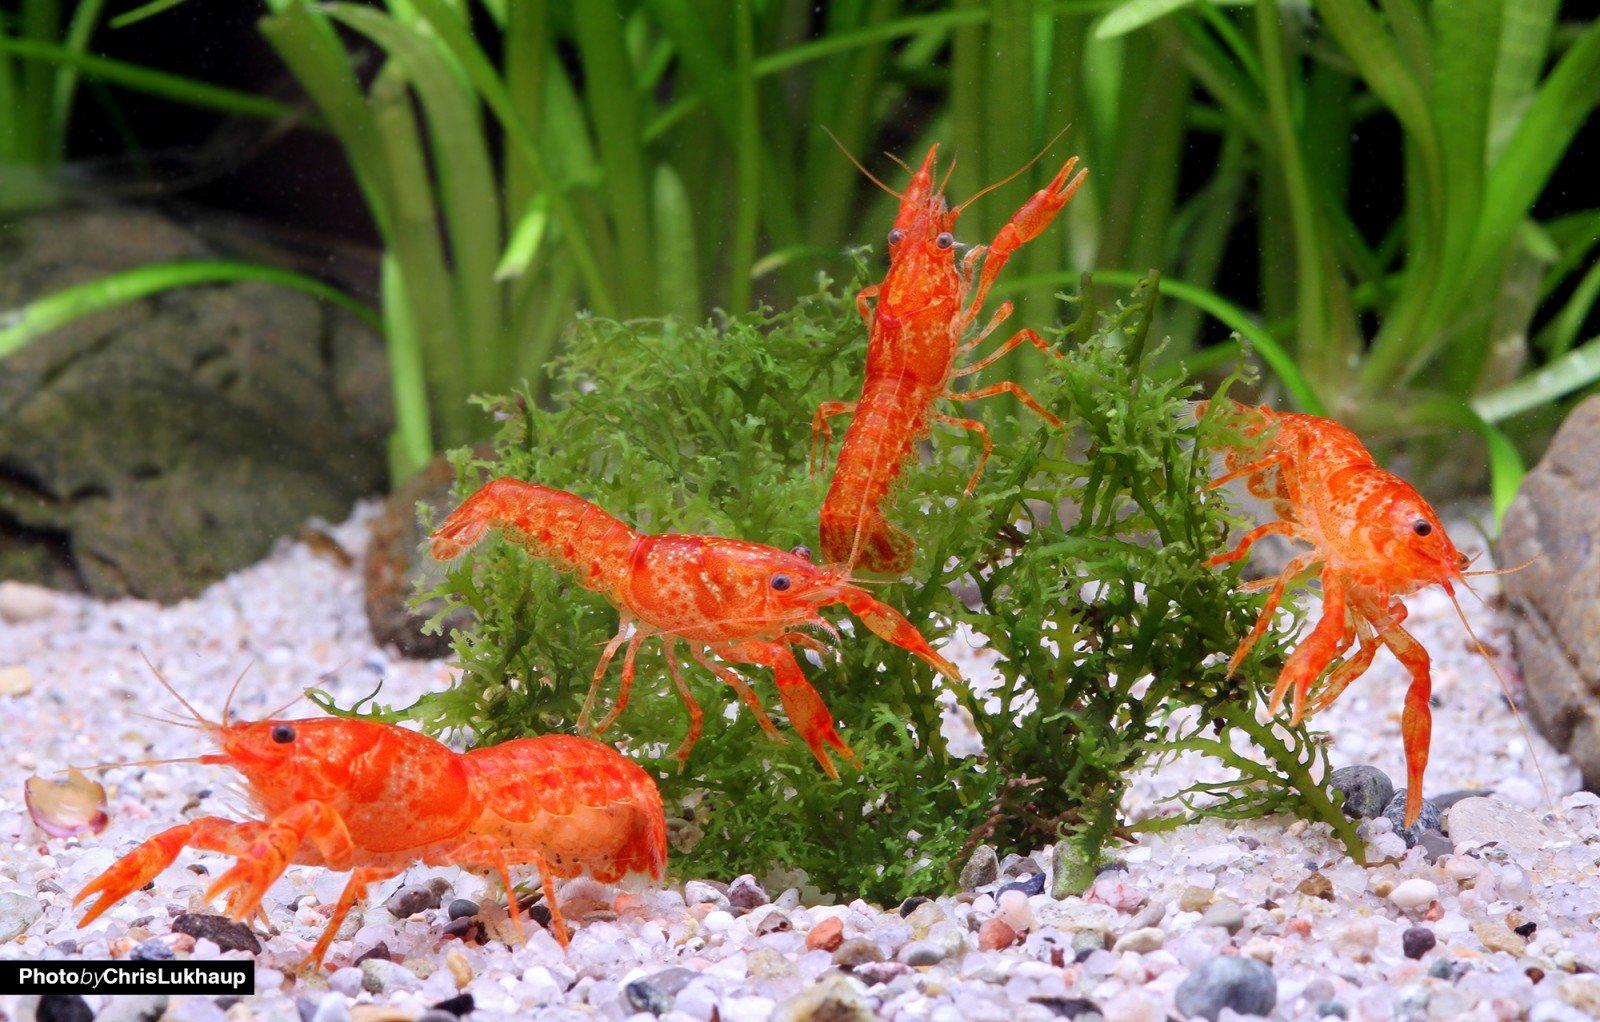 [Garnelio] Oranger Zwergflusskrebs - CPO - Cambarellus patzcuarensis -